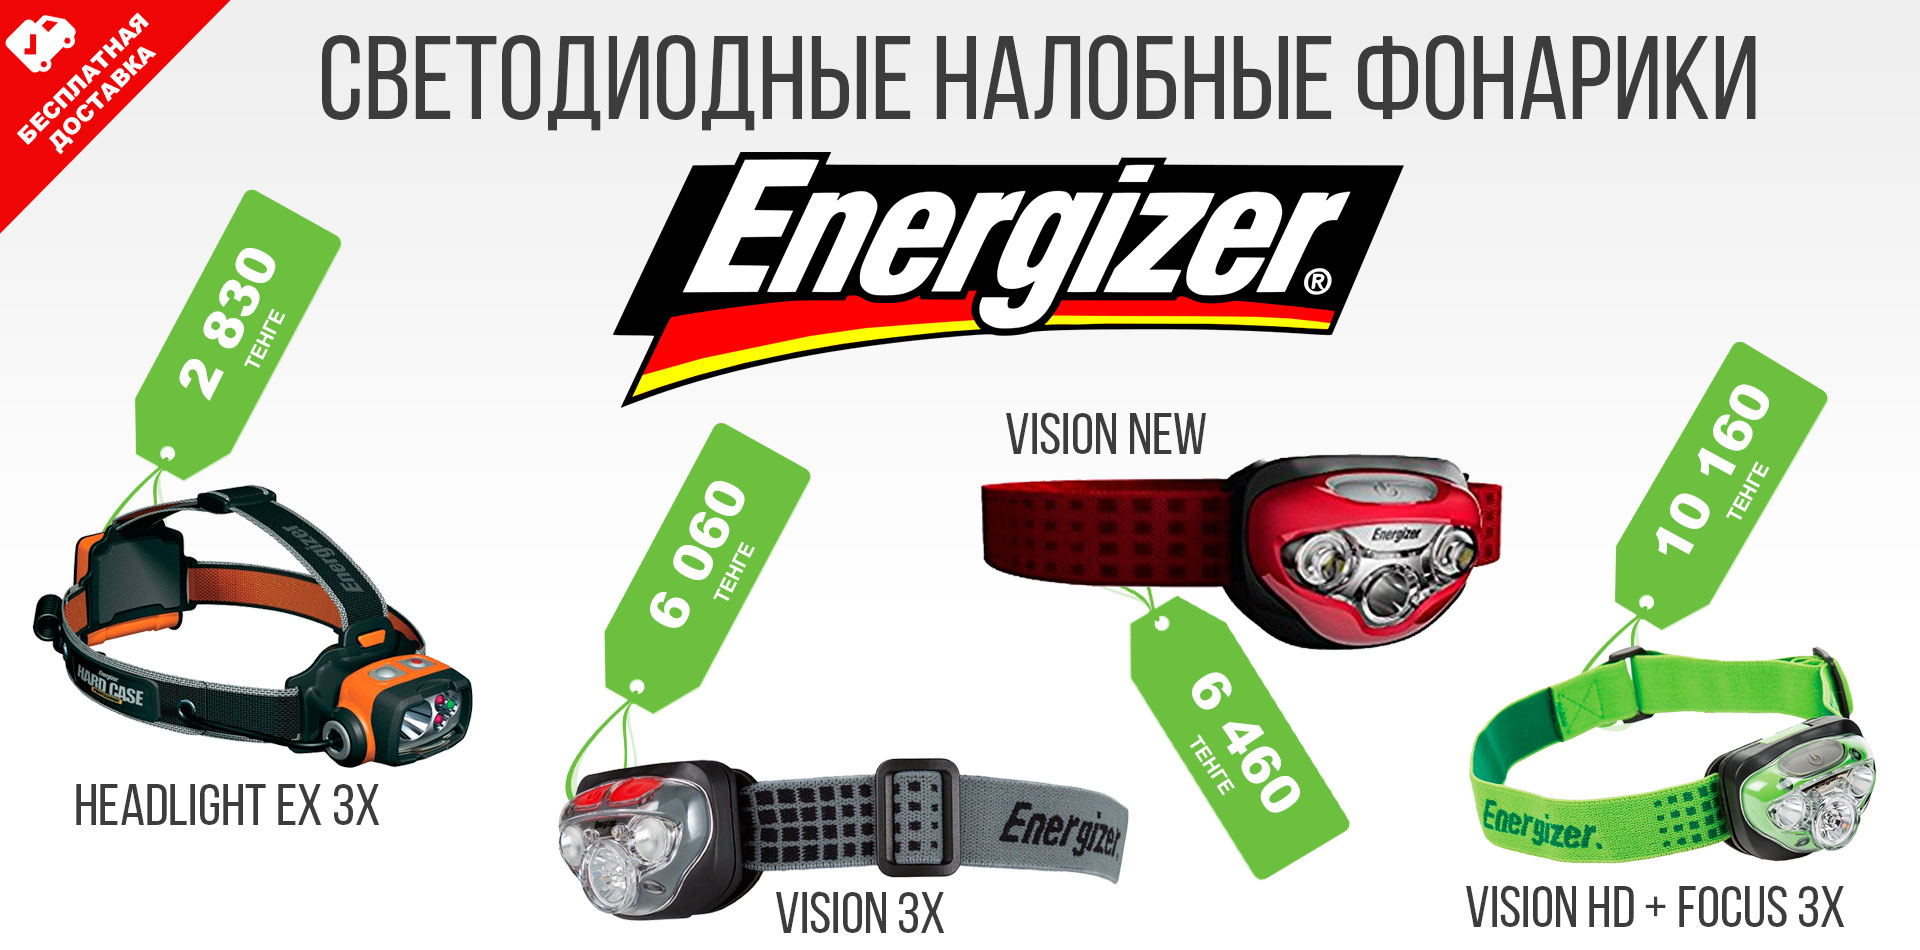 ФОНАРИКИ ENERGIZER